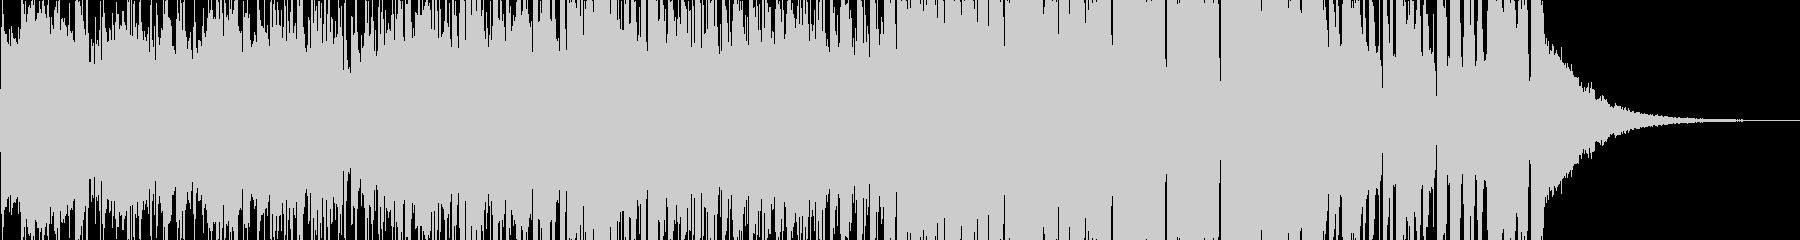 Brass Sectionの未再生の波形